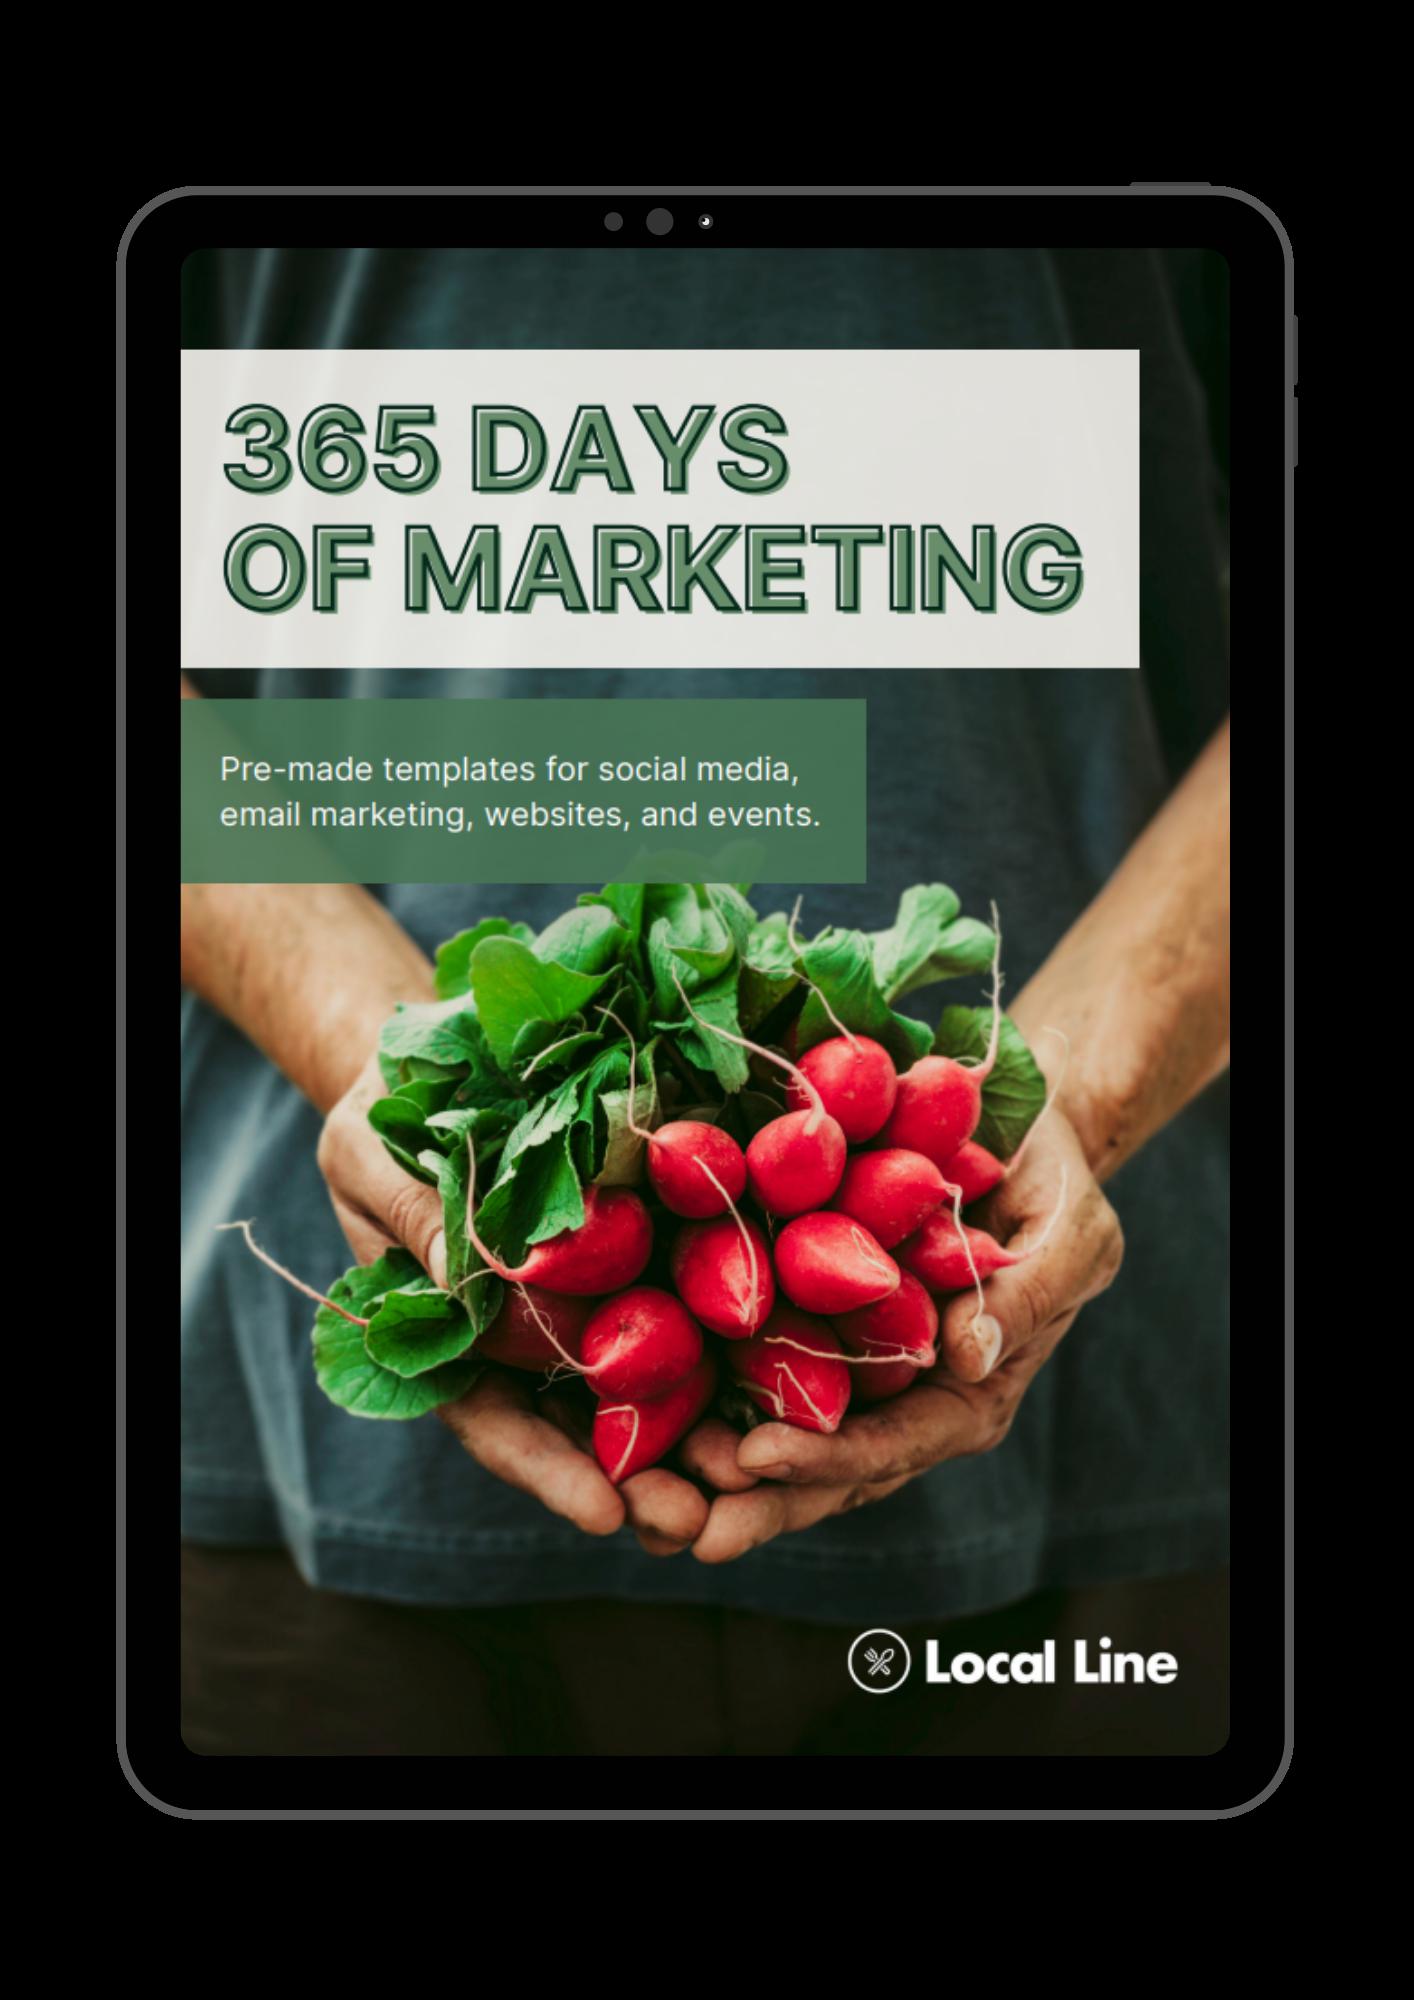 Local Line_365 Days of Marketing